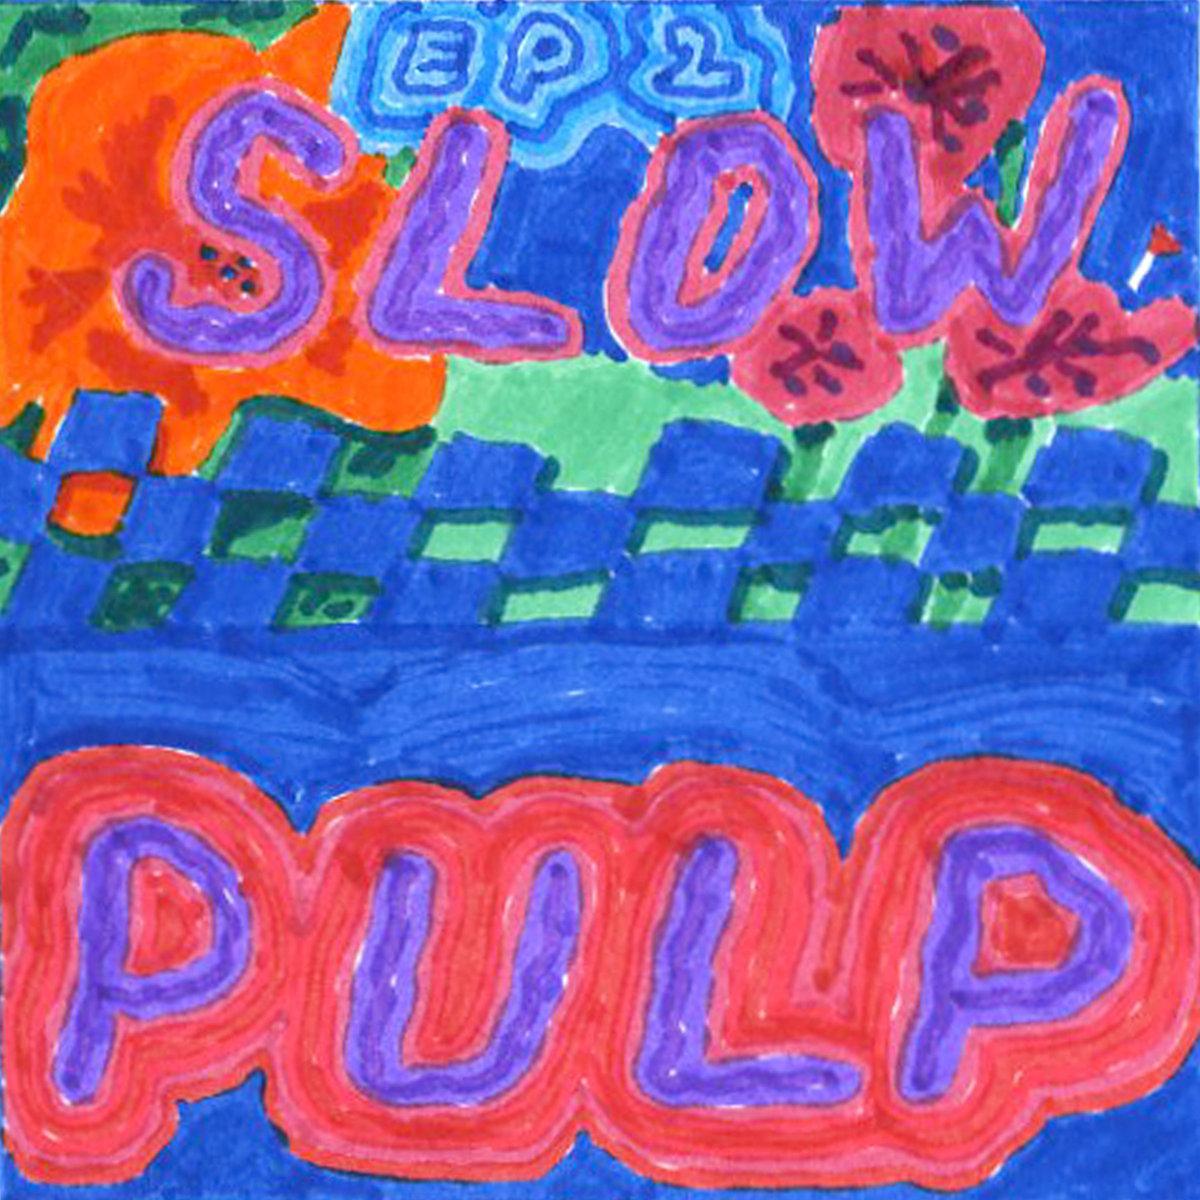 Slow Pulp / EP2(Ltd CD)